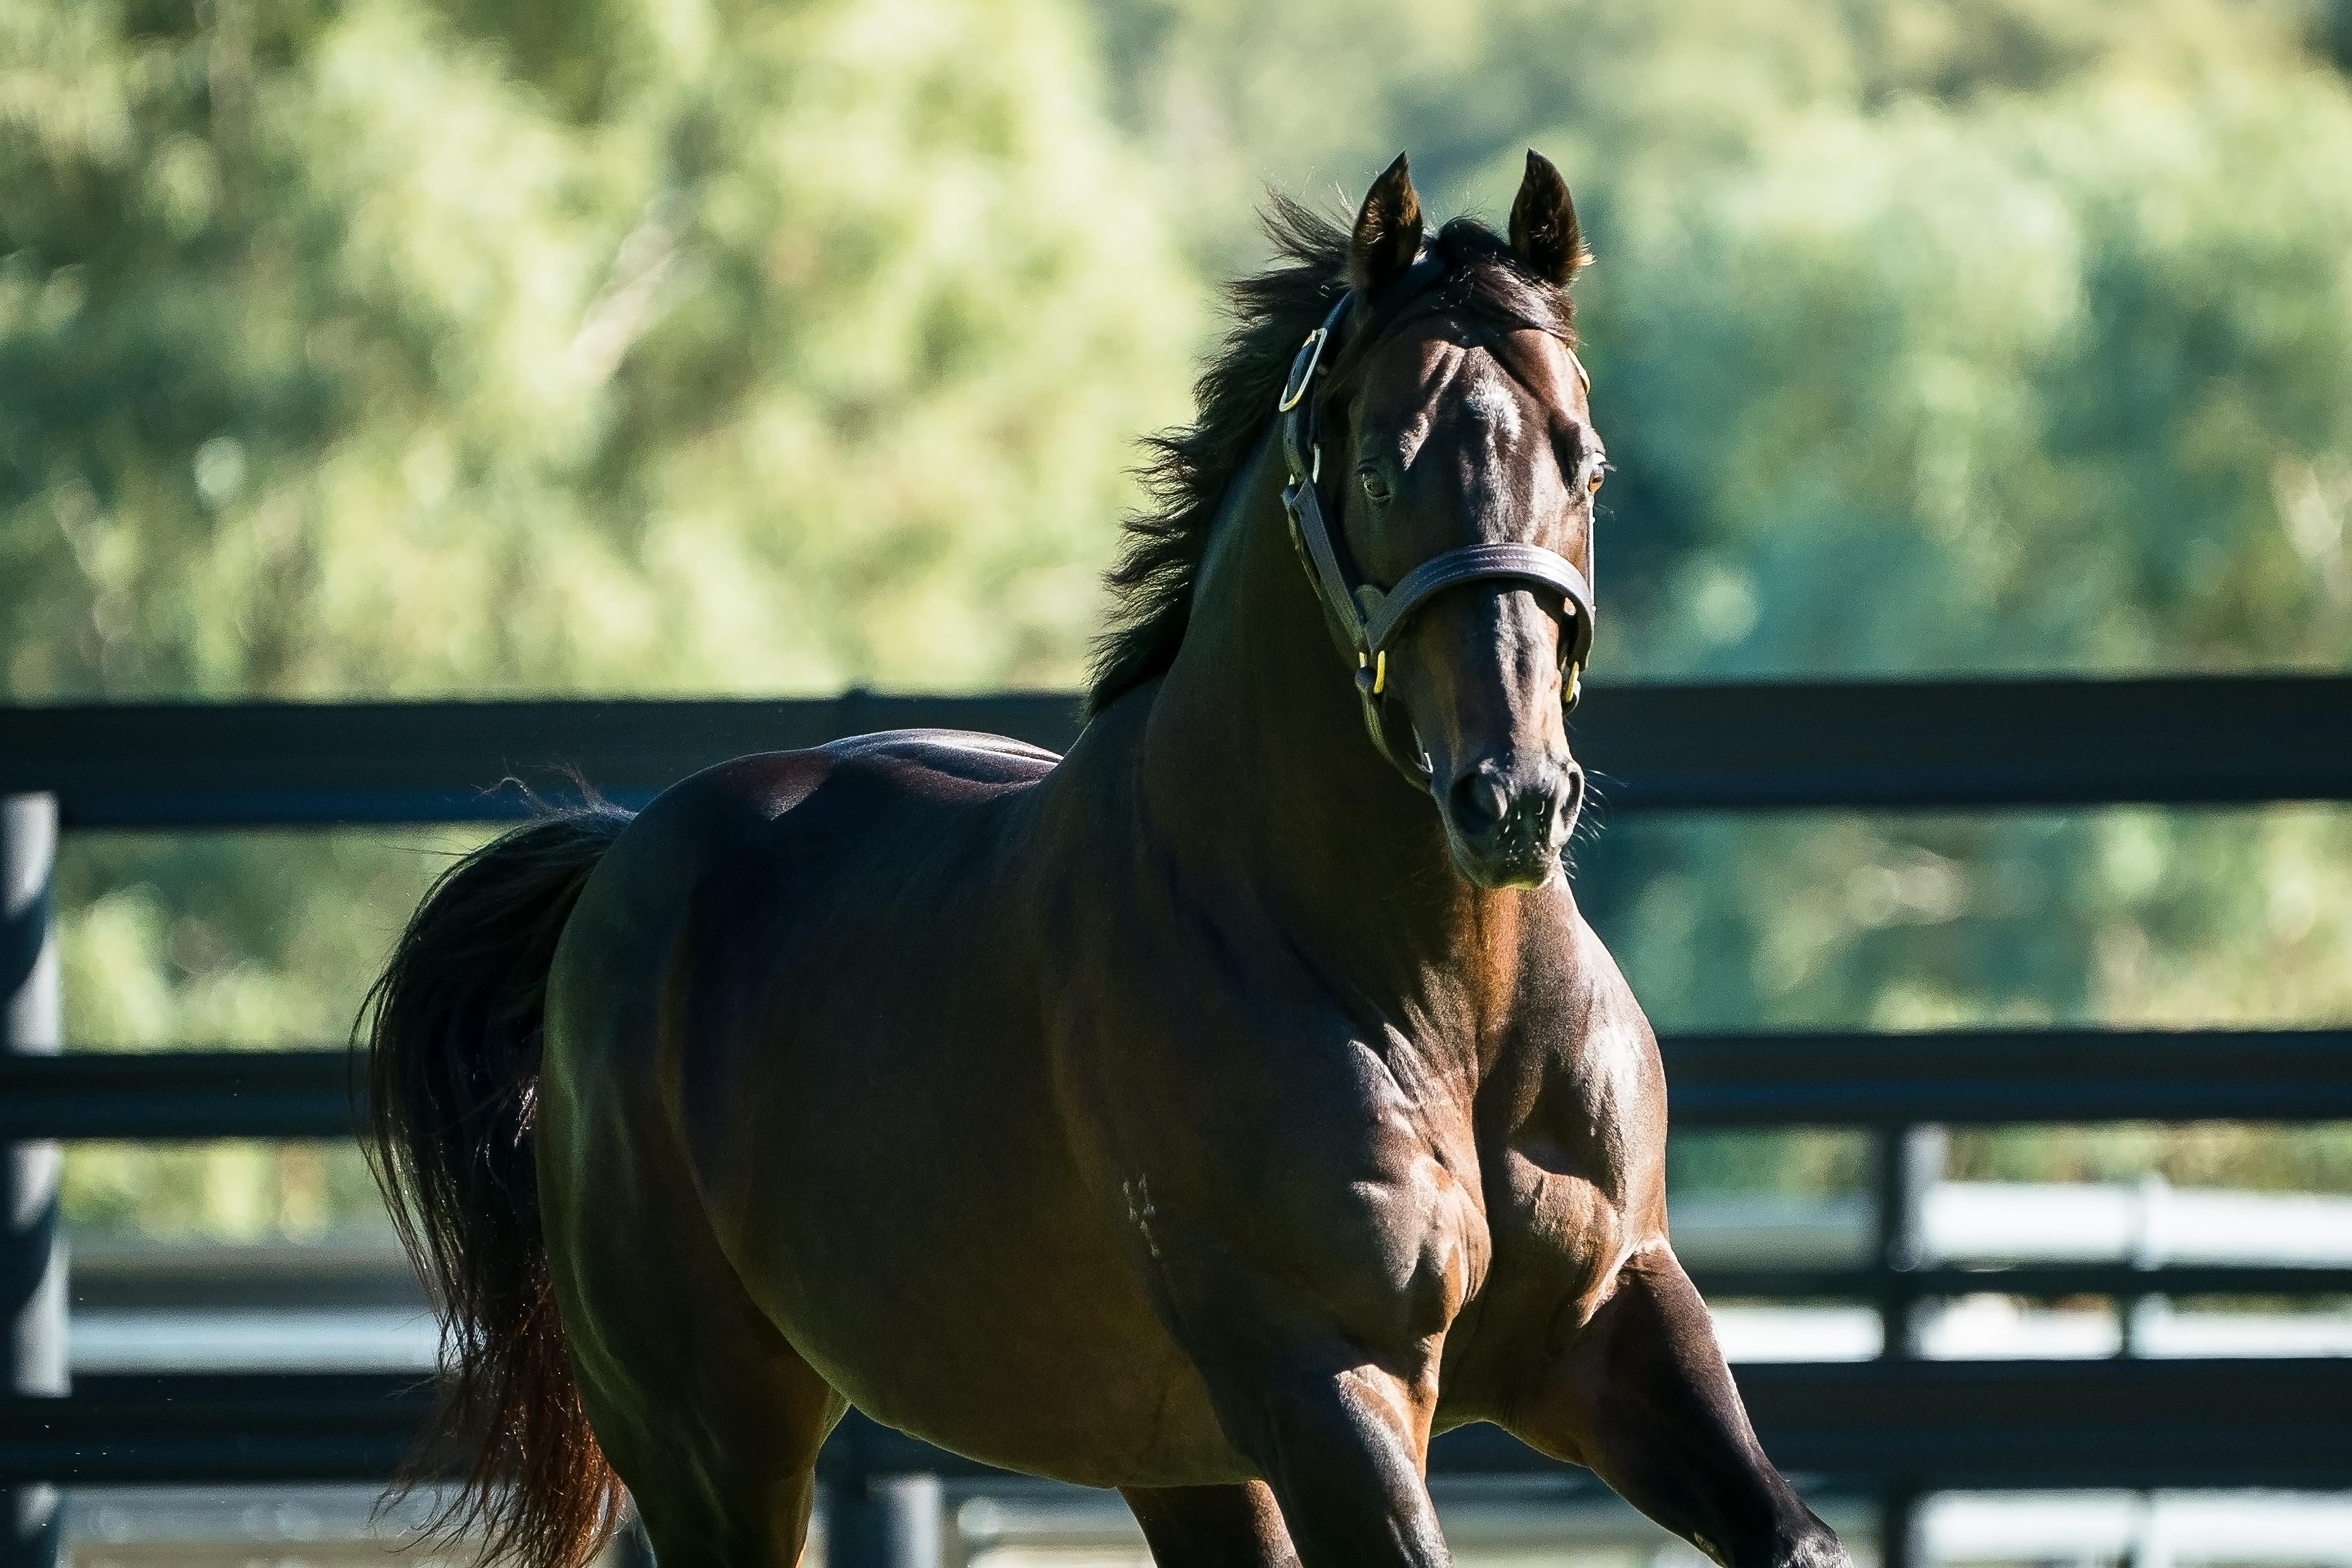 https://www.stallions.com.au/wp-content/uploads/2020/04/Supido-12.jpg